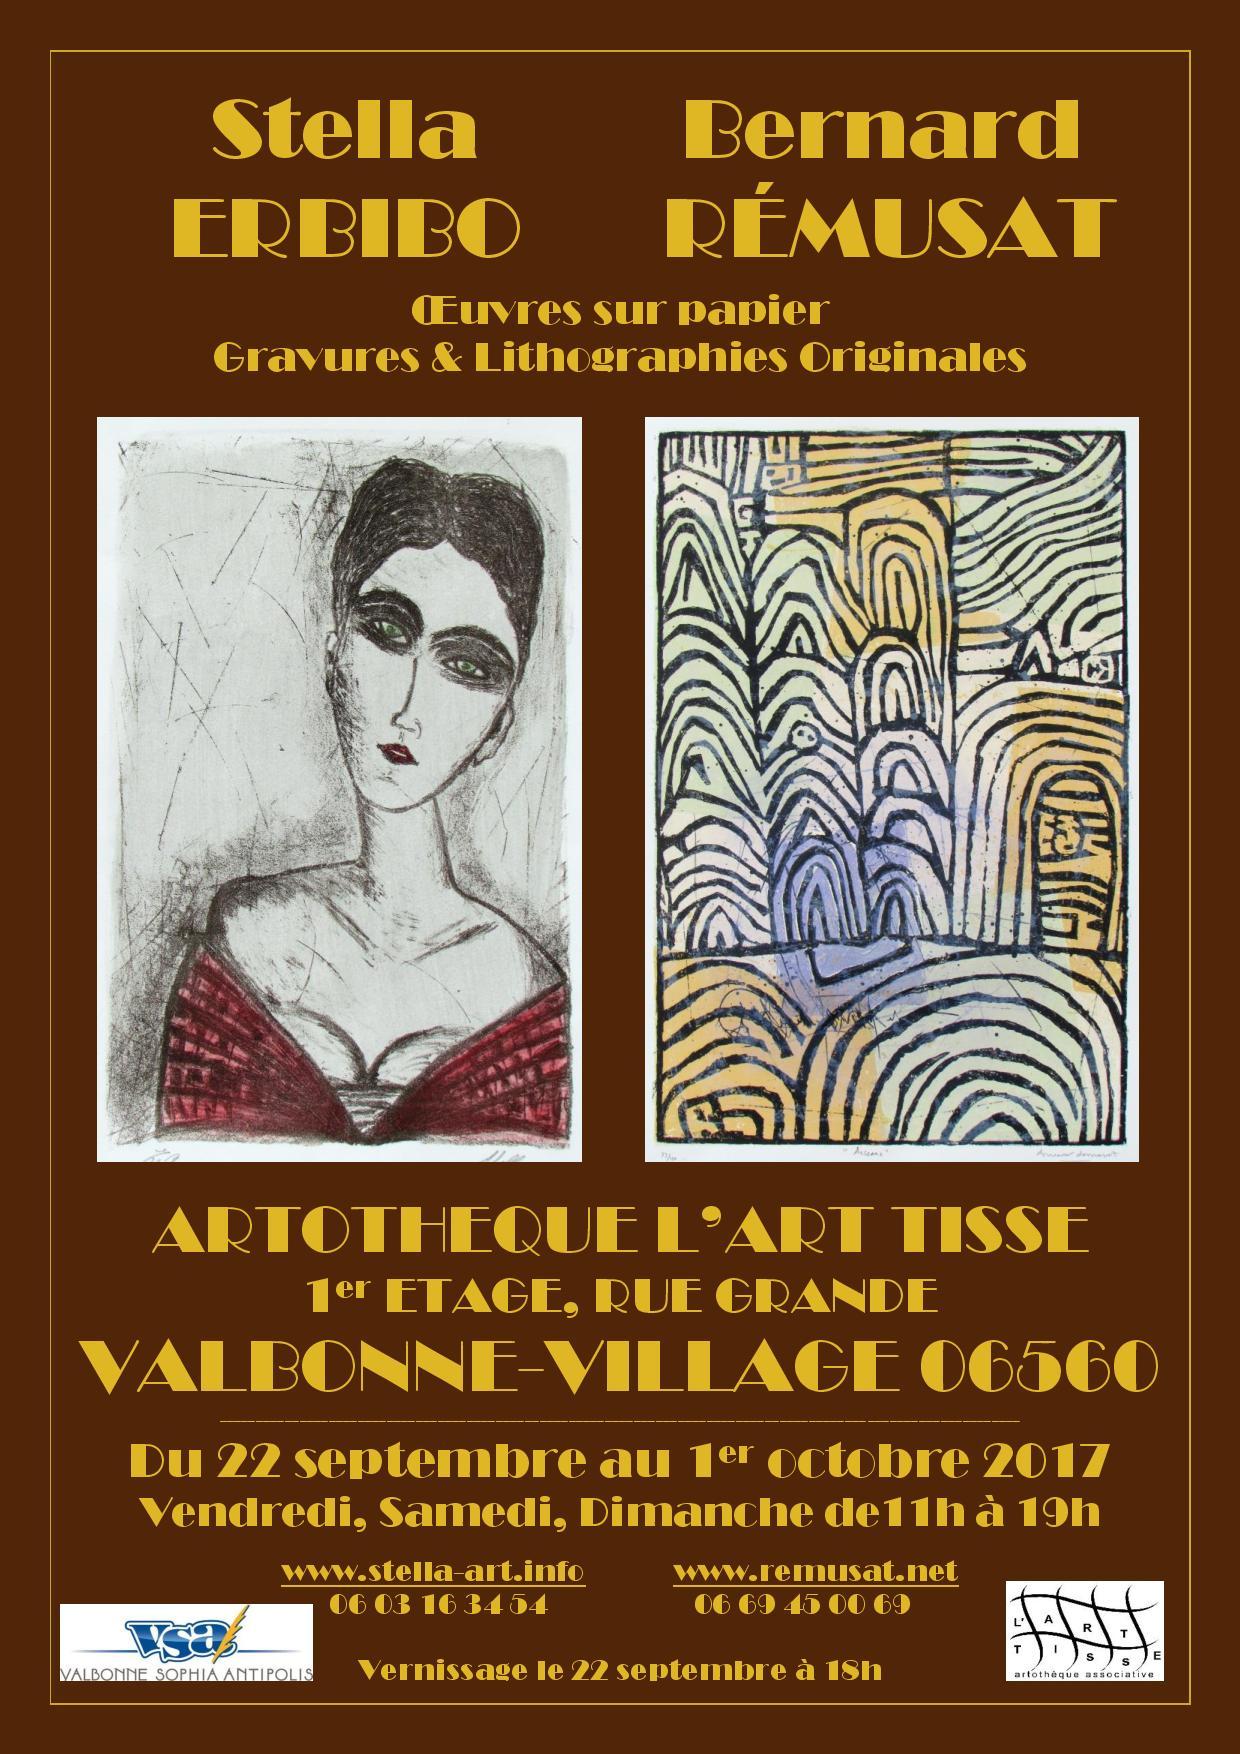 AFFICHE VALBONNE ARTOTHEQUE-page-001